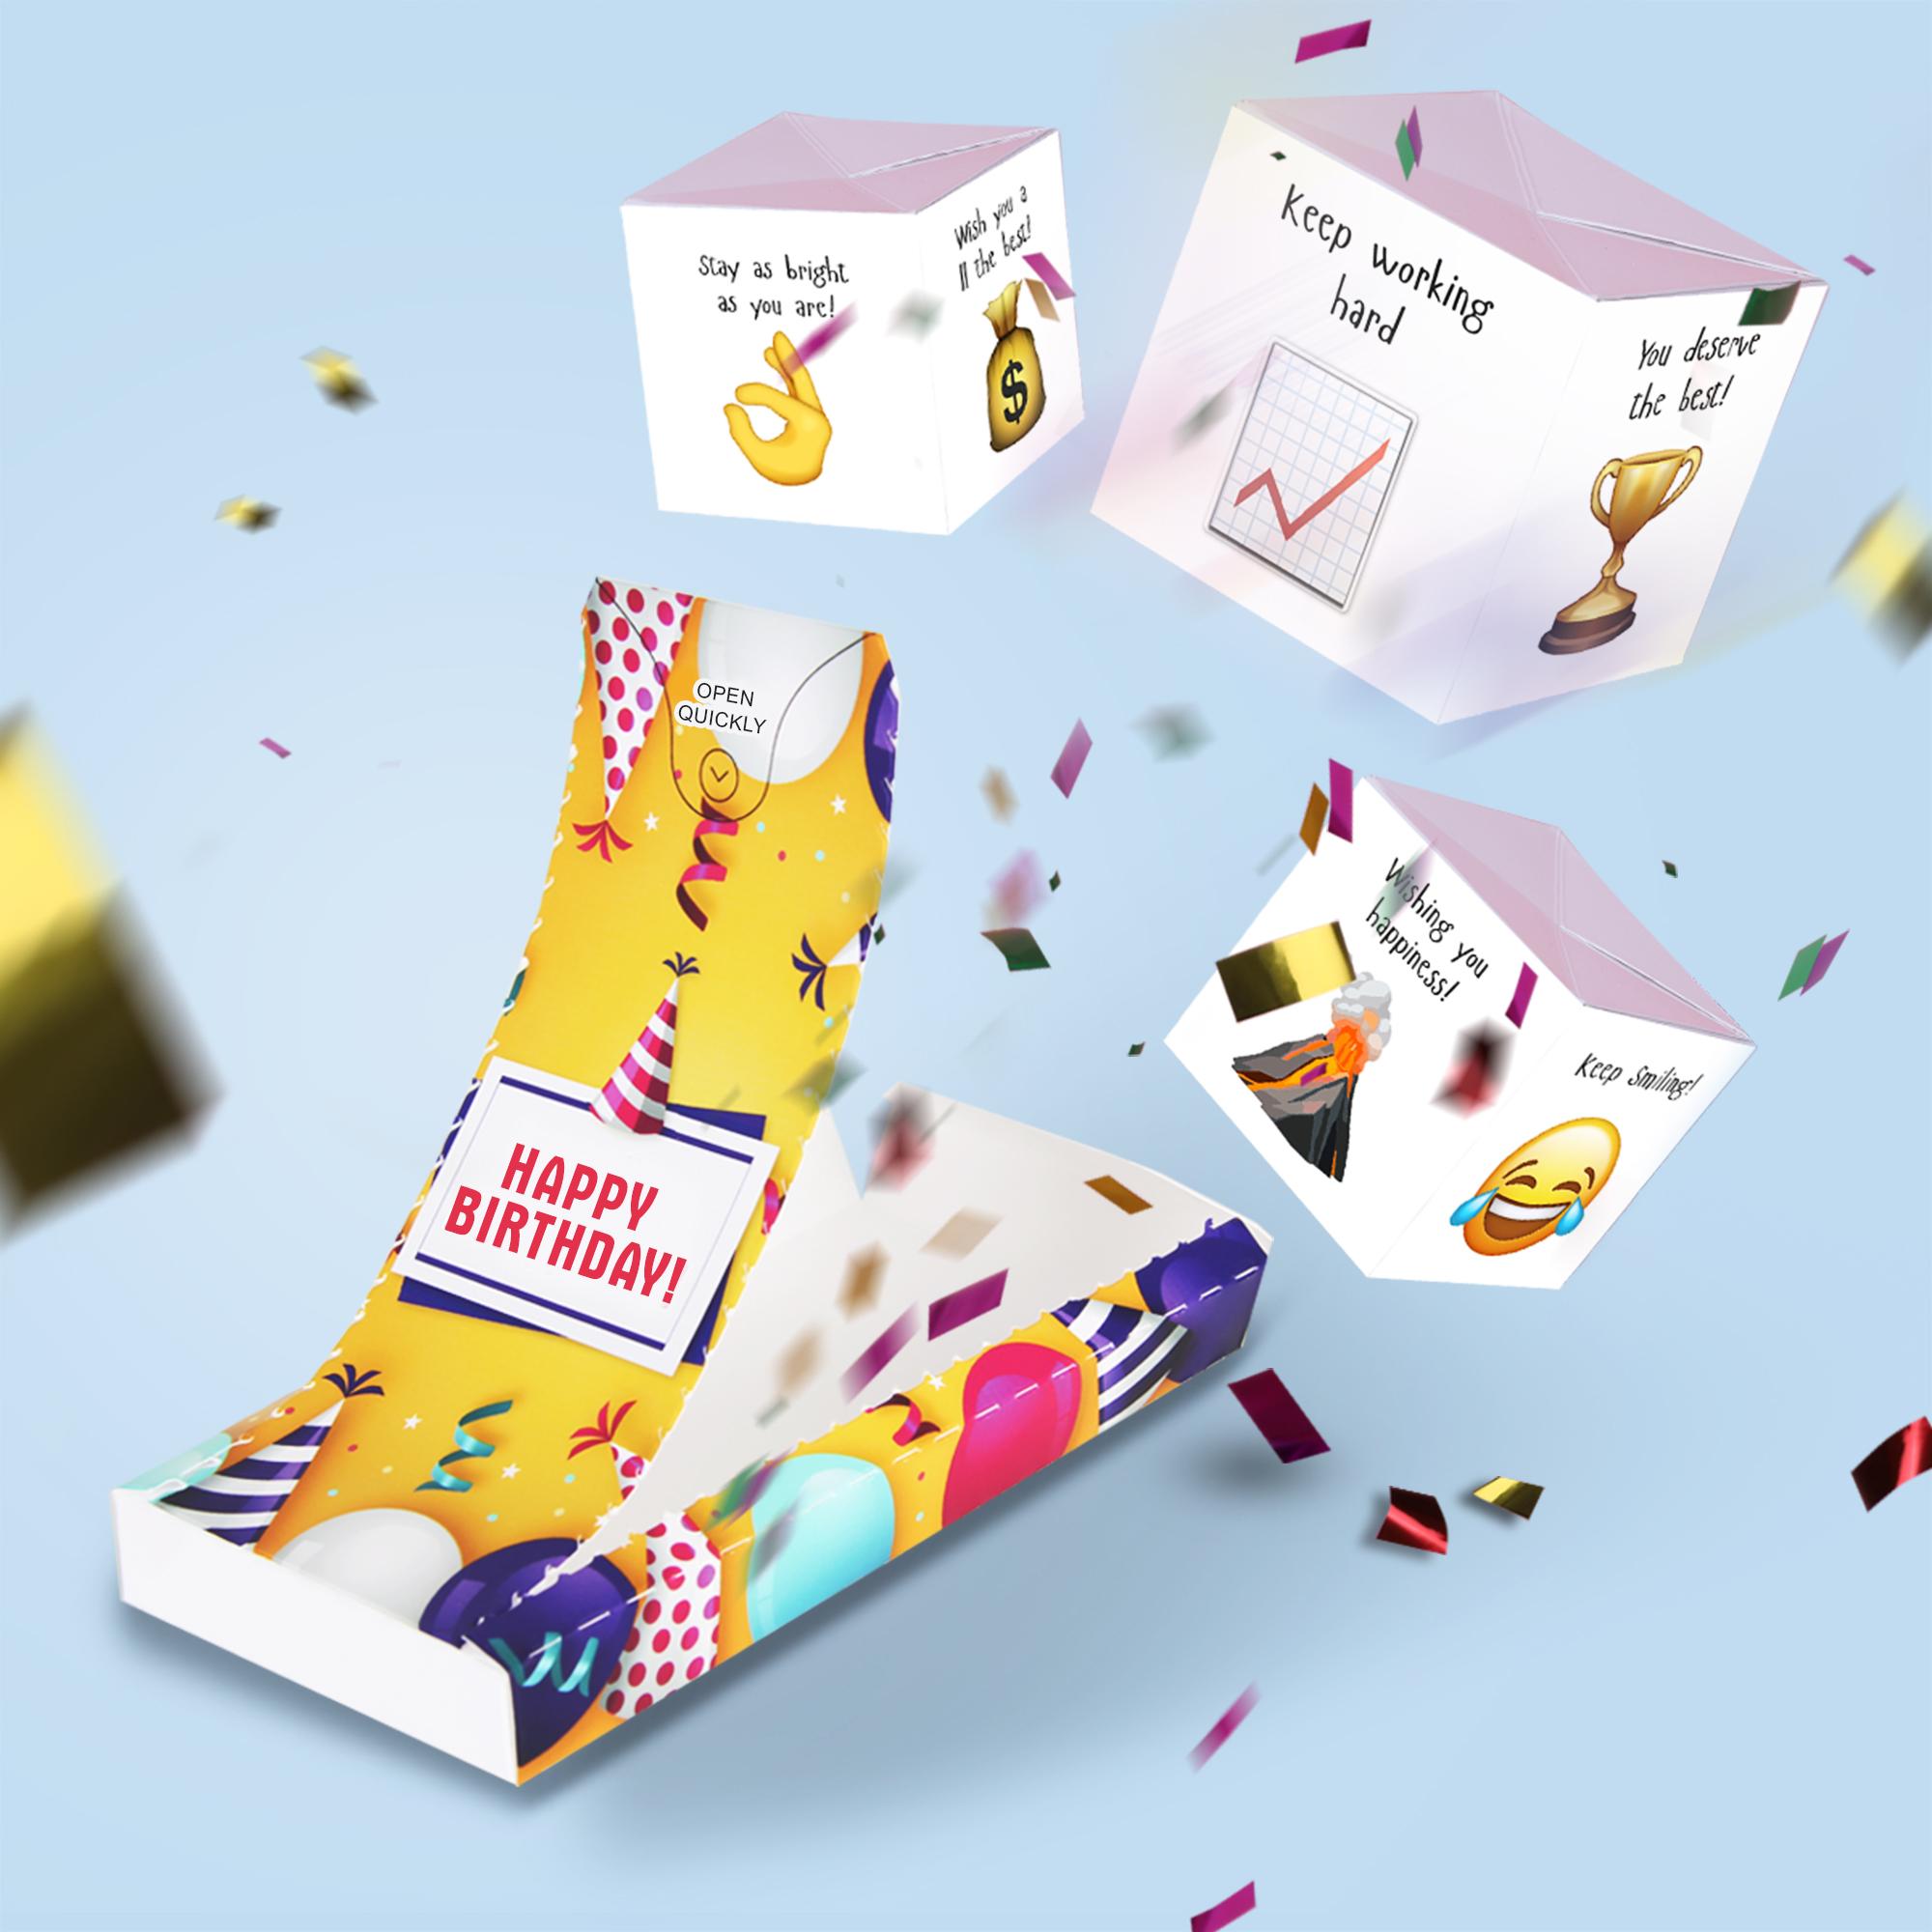 Boom card - Happy Birthday! (3 cubes)